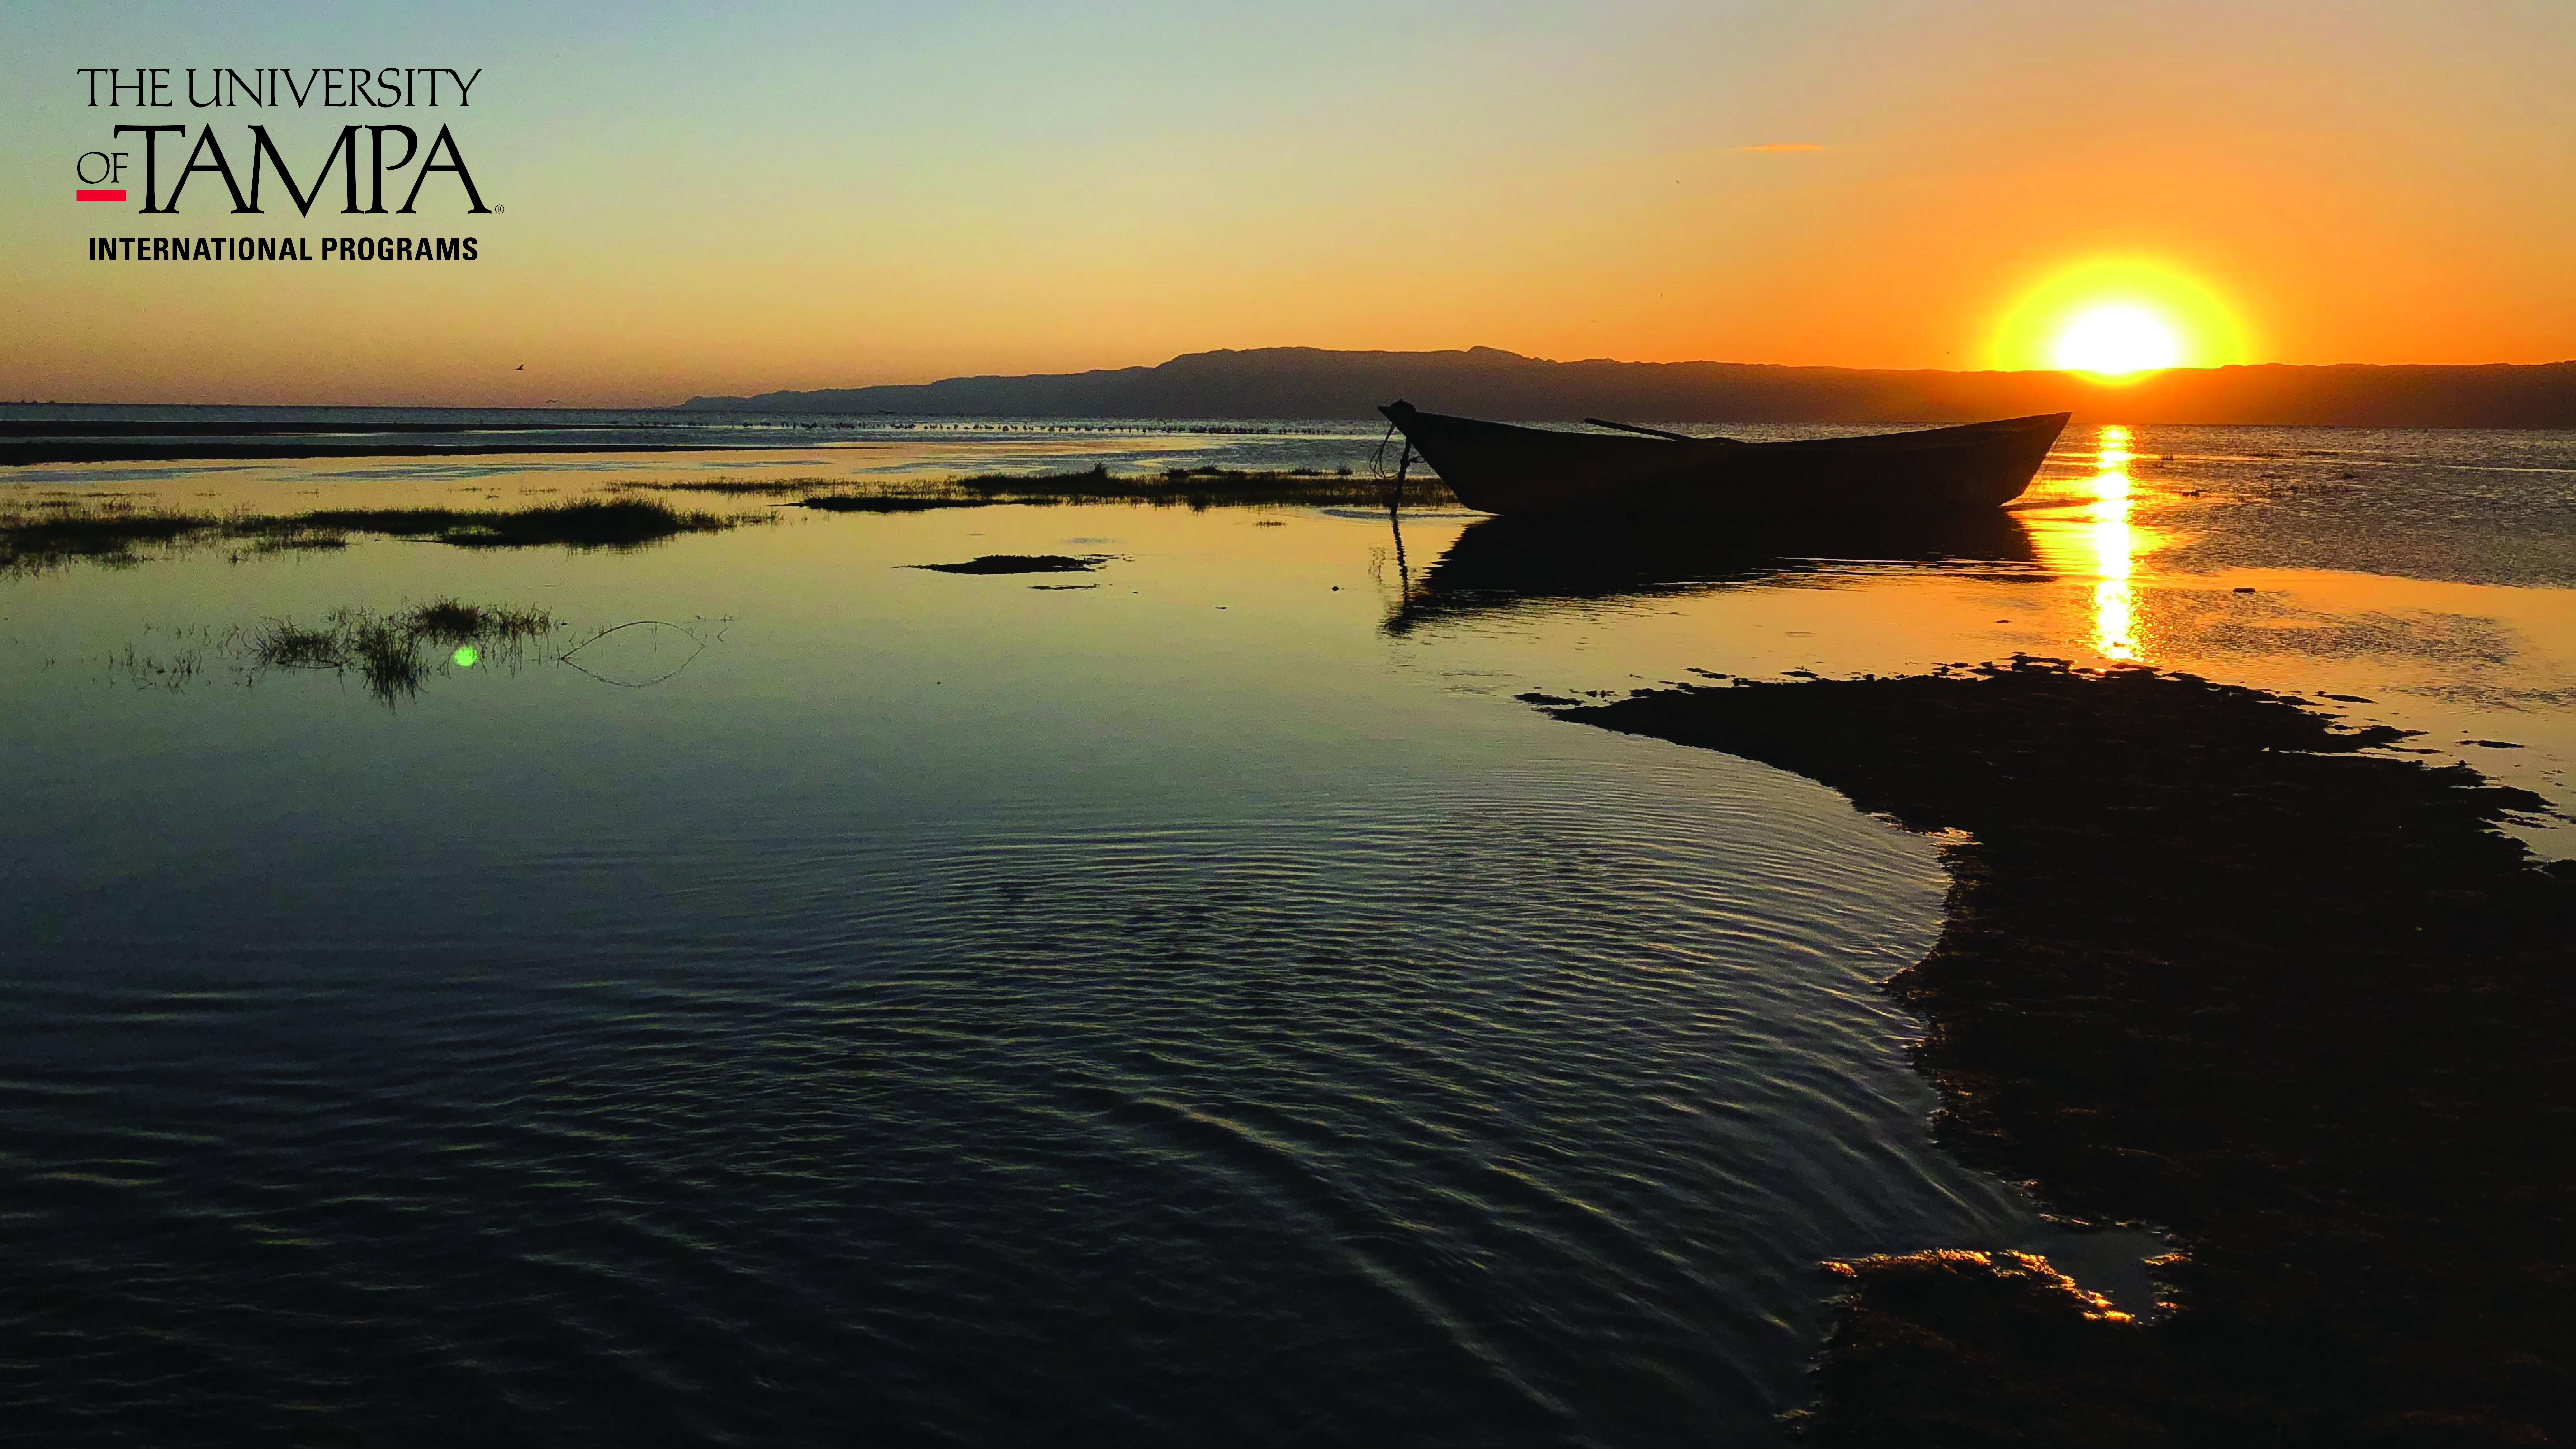 Sunset on Lake Eyasi in Tanzania (Photographer: Troy Cusson, Music Technology Coordinator)